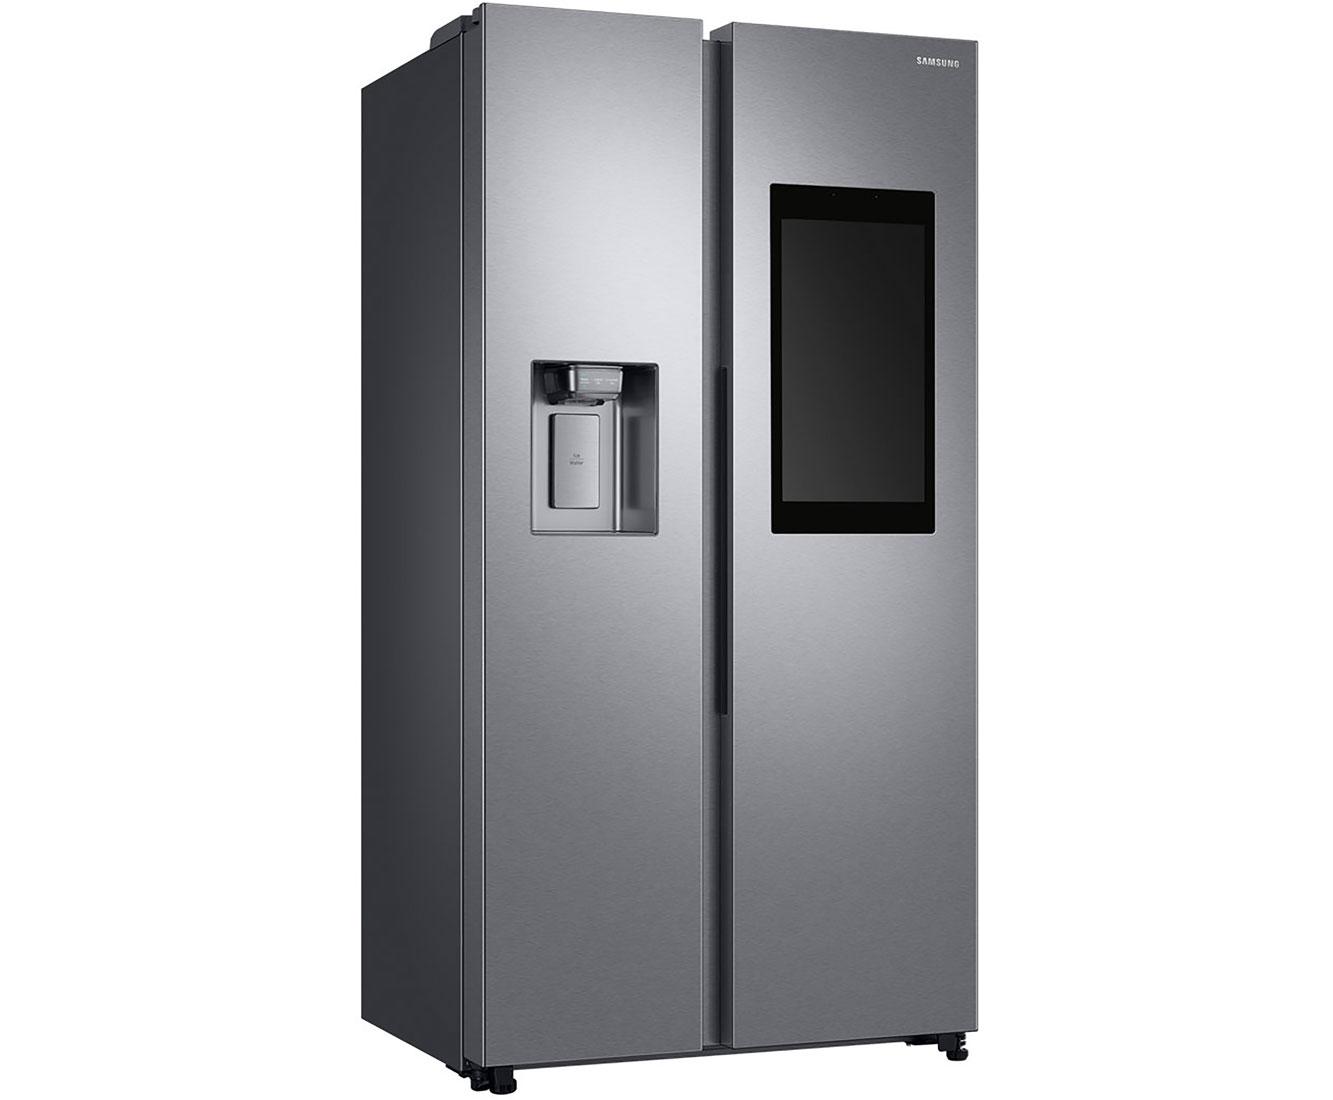 Side By Side Kühlschrank Real : Side by side k hlschrank g nstig kühlschrank ohne gefrierfach lg